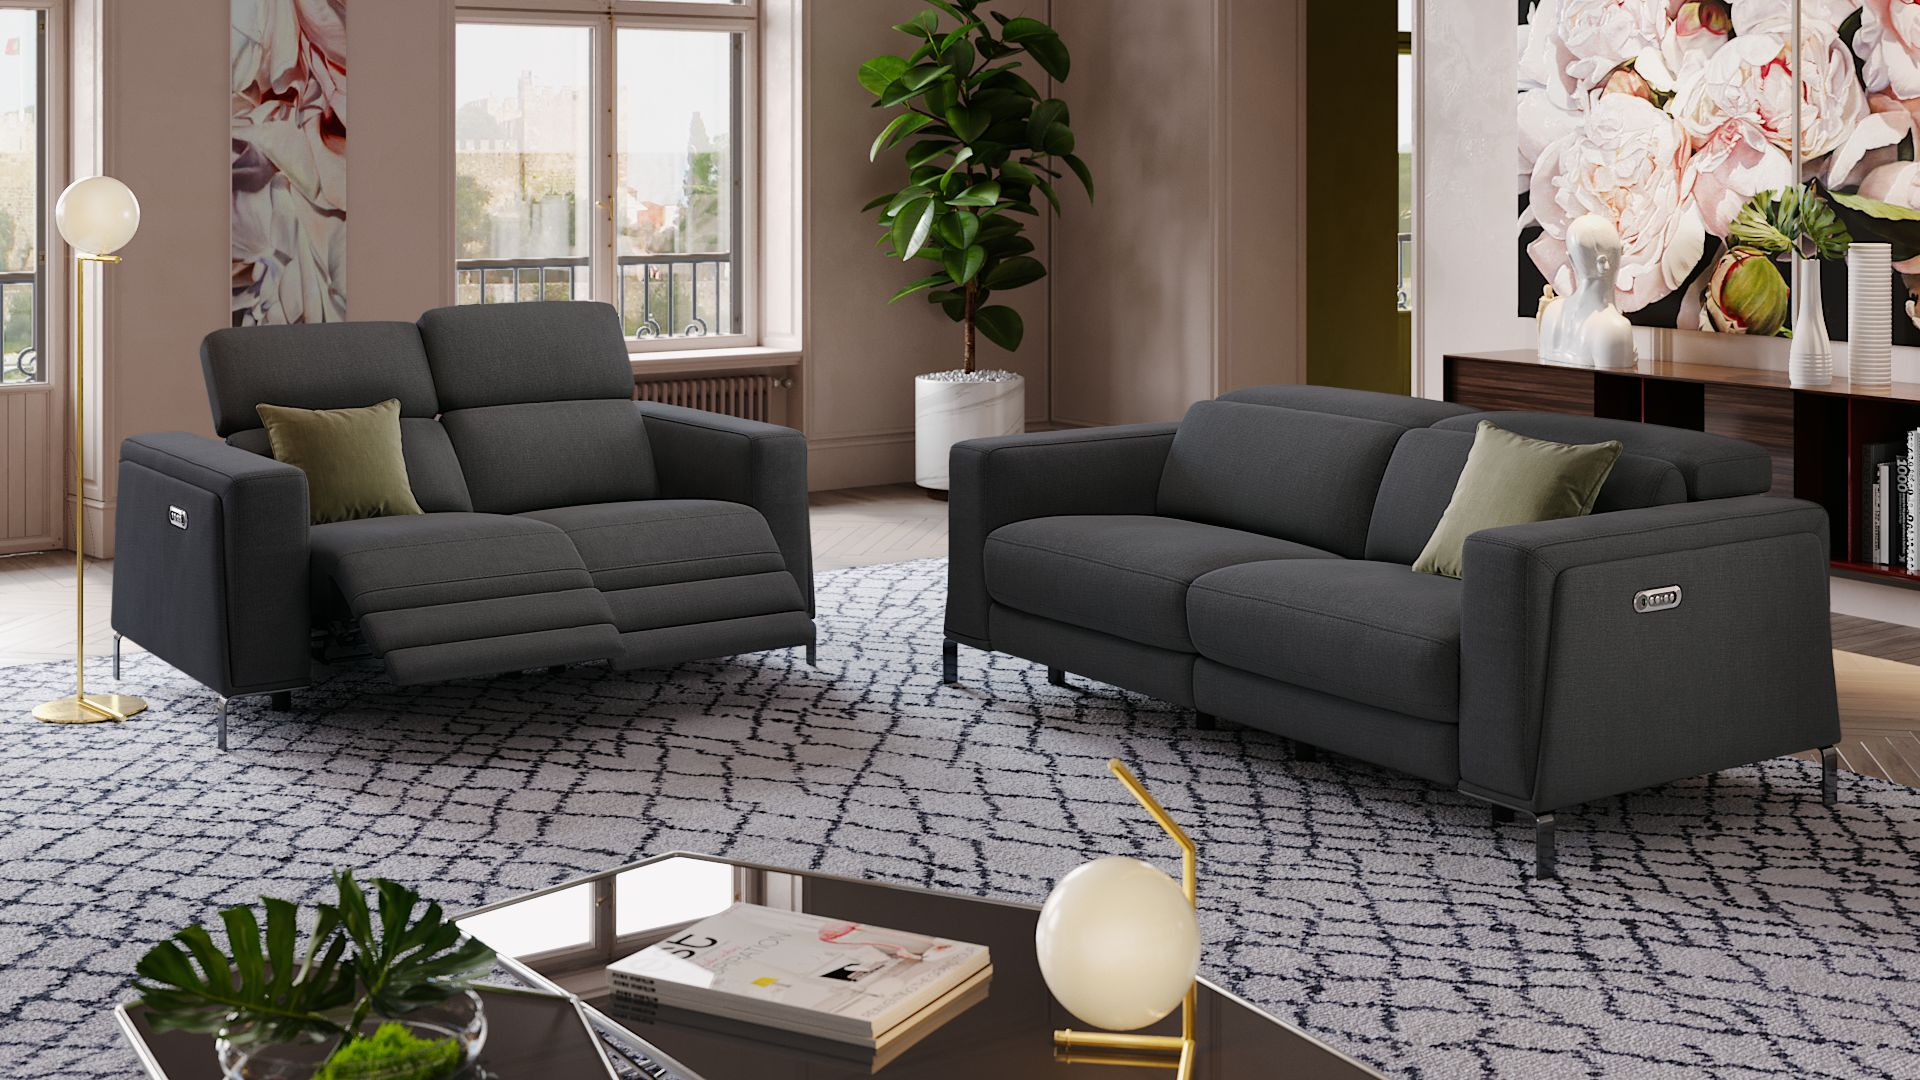 Stoff 2-Sitzer Sofa CASOLI